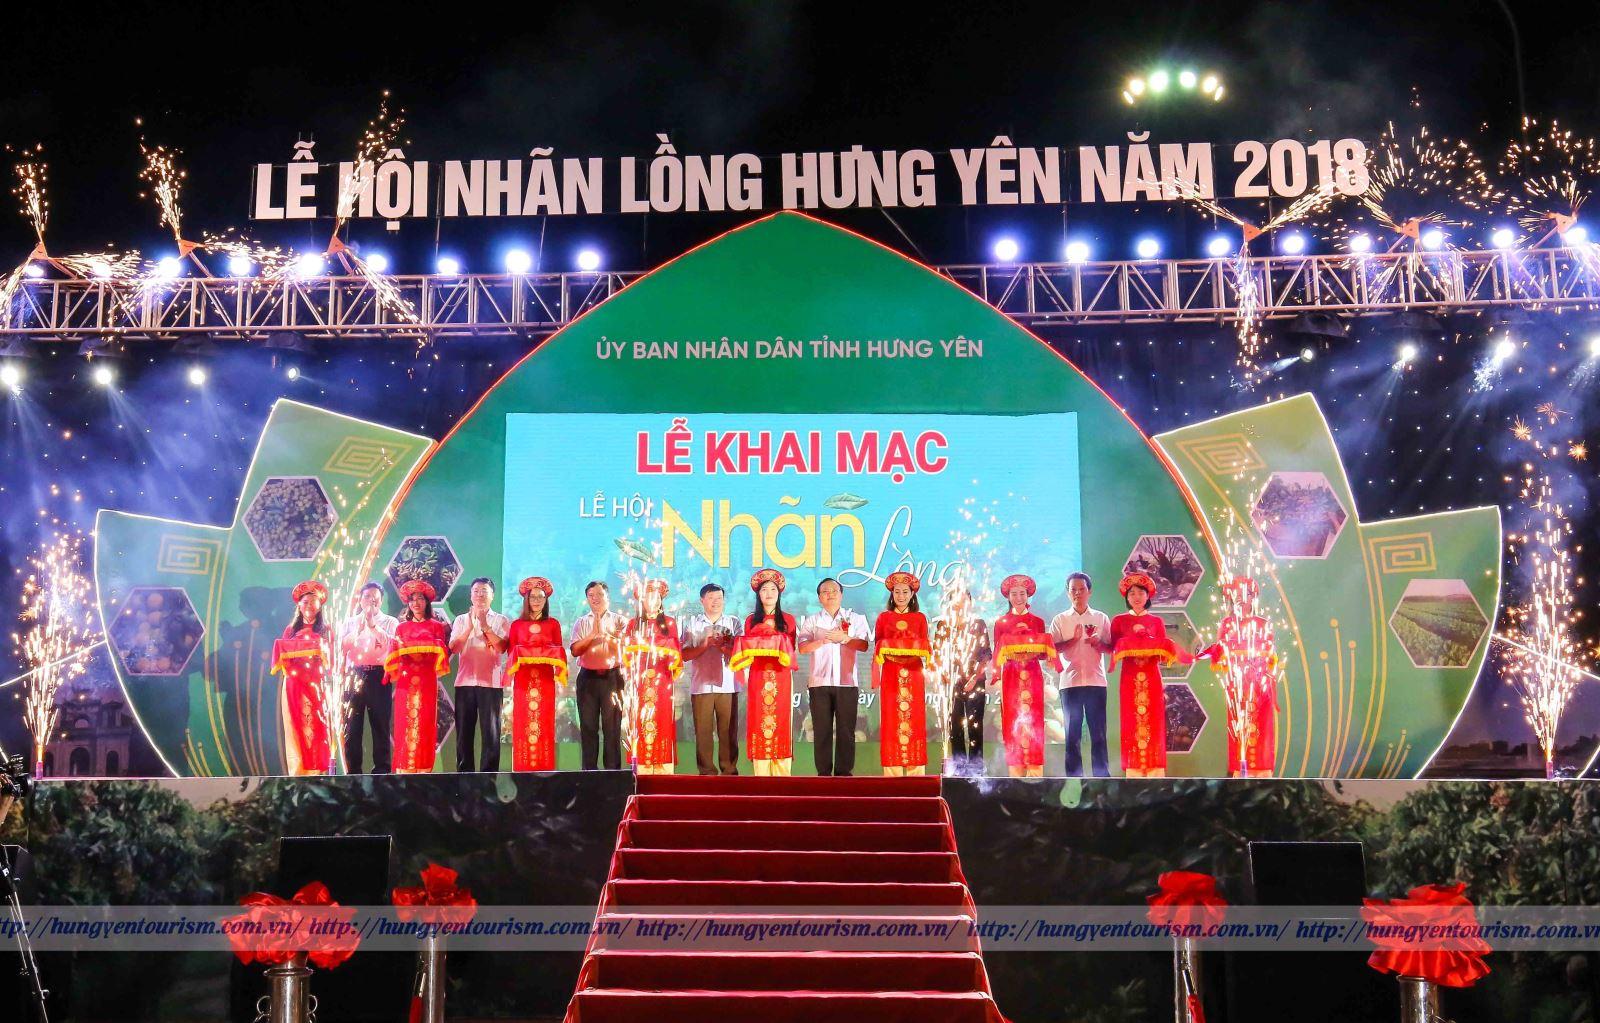 http://hungyentourism.com.vn/hung-yen-khai-mac-hoi-cho-xuan-ky-hoi-nam-2019/